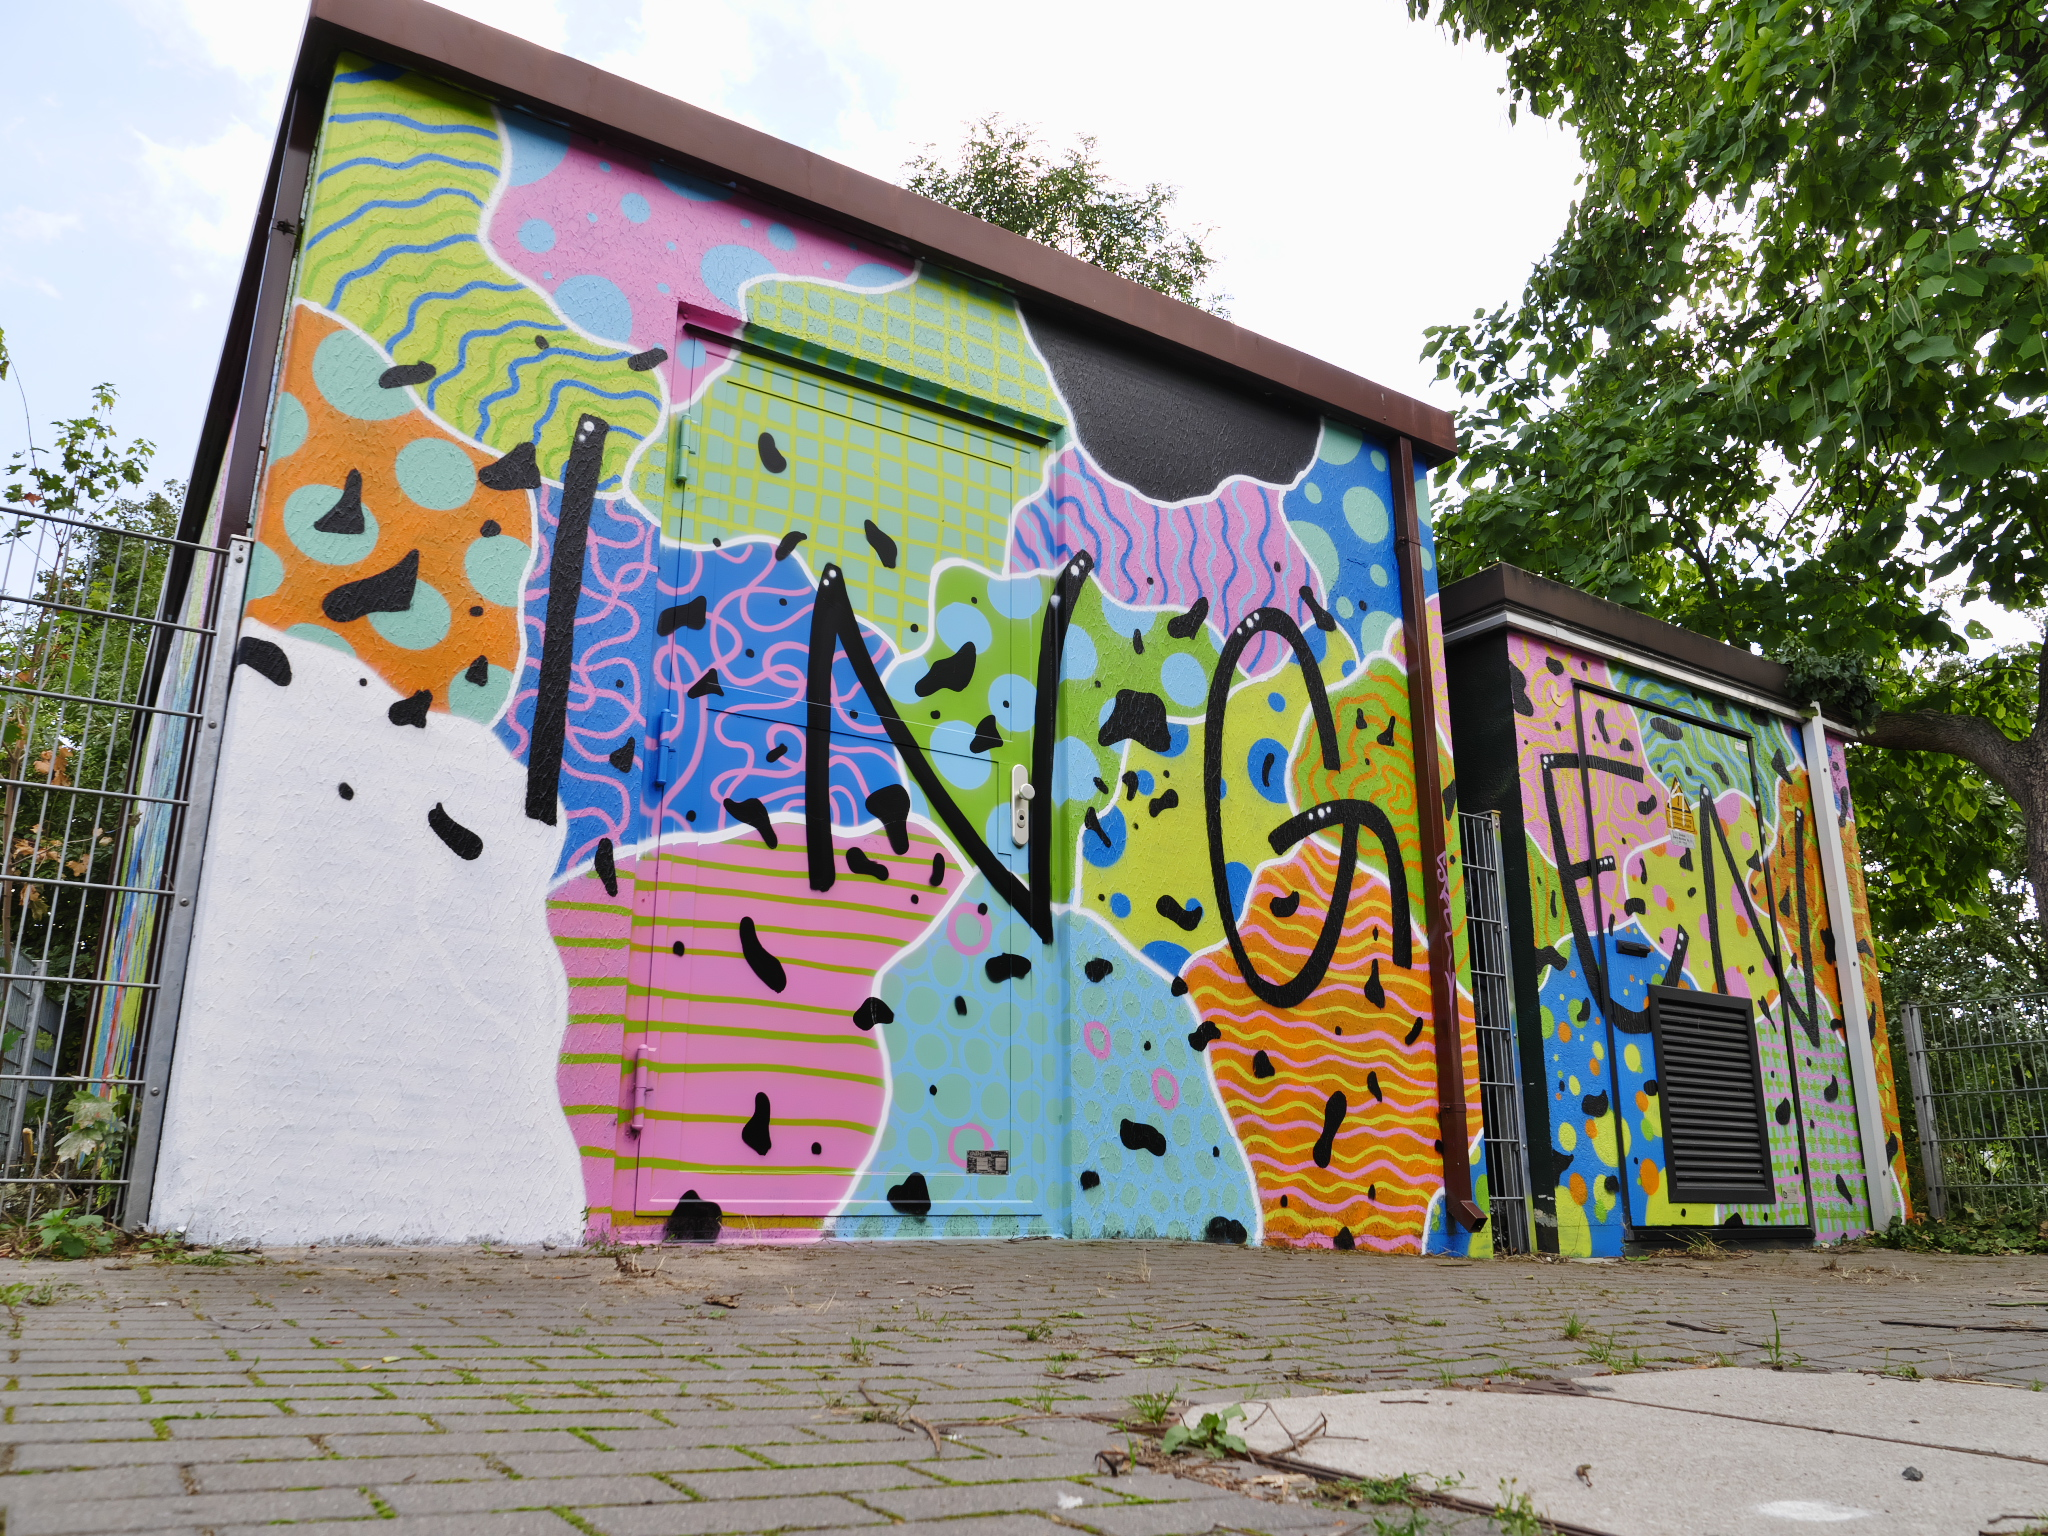 jugendkulturjahr-2020-ratingen-jkj2020-graffiti-trafohaeuschen-stadtwerke-Bild07